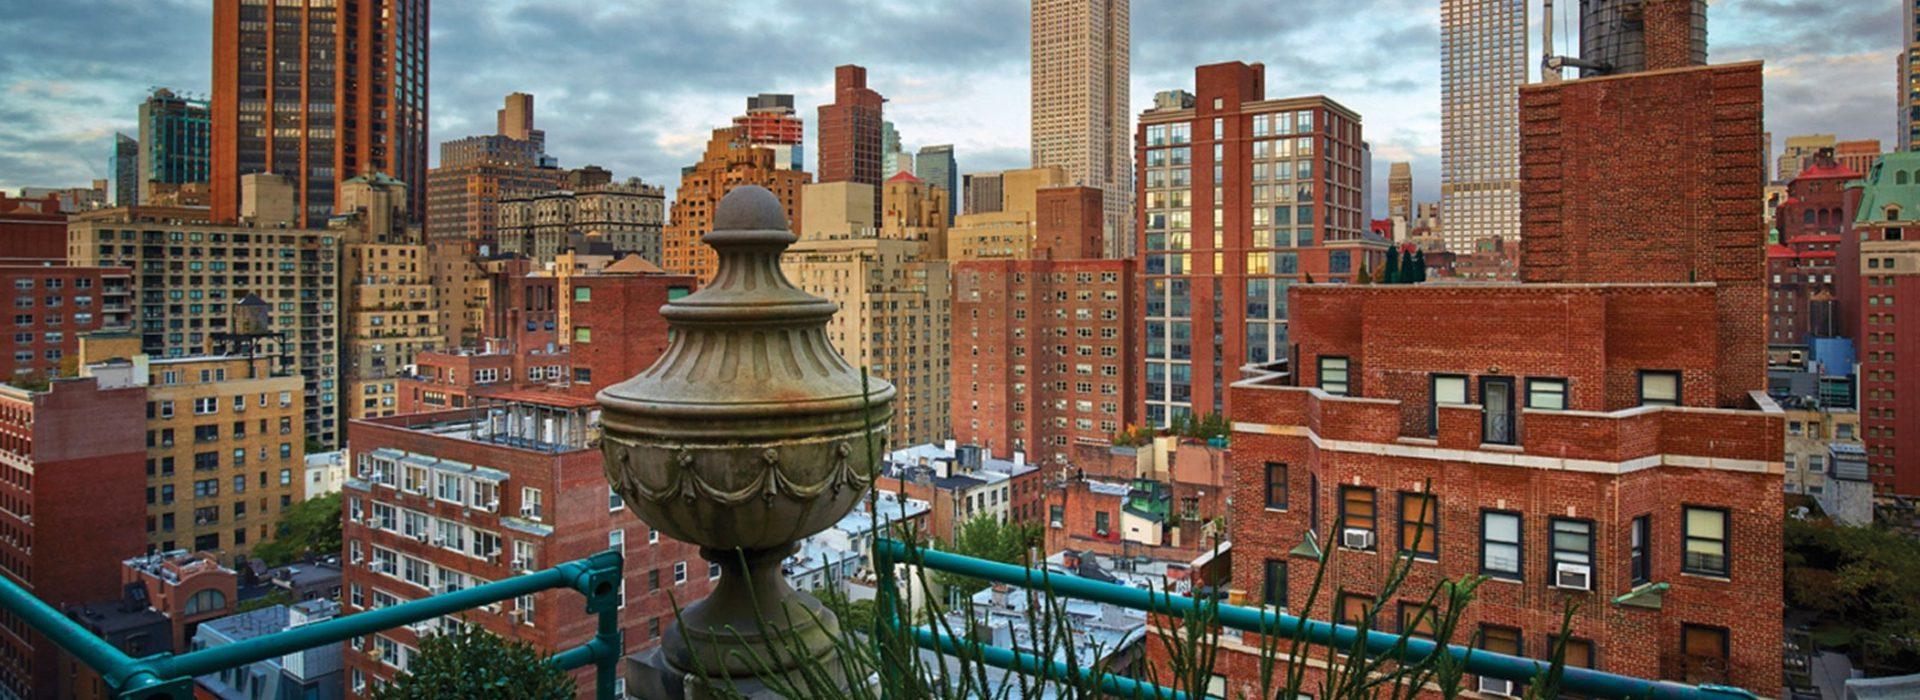 New York Manhattan Nyc An Affinia Hotel Jan Feb 2017 Wendy Veal Luxury Travel